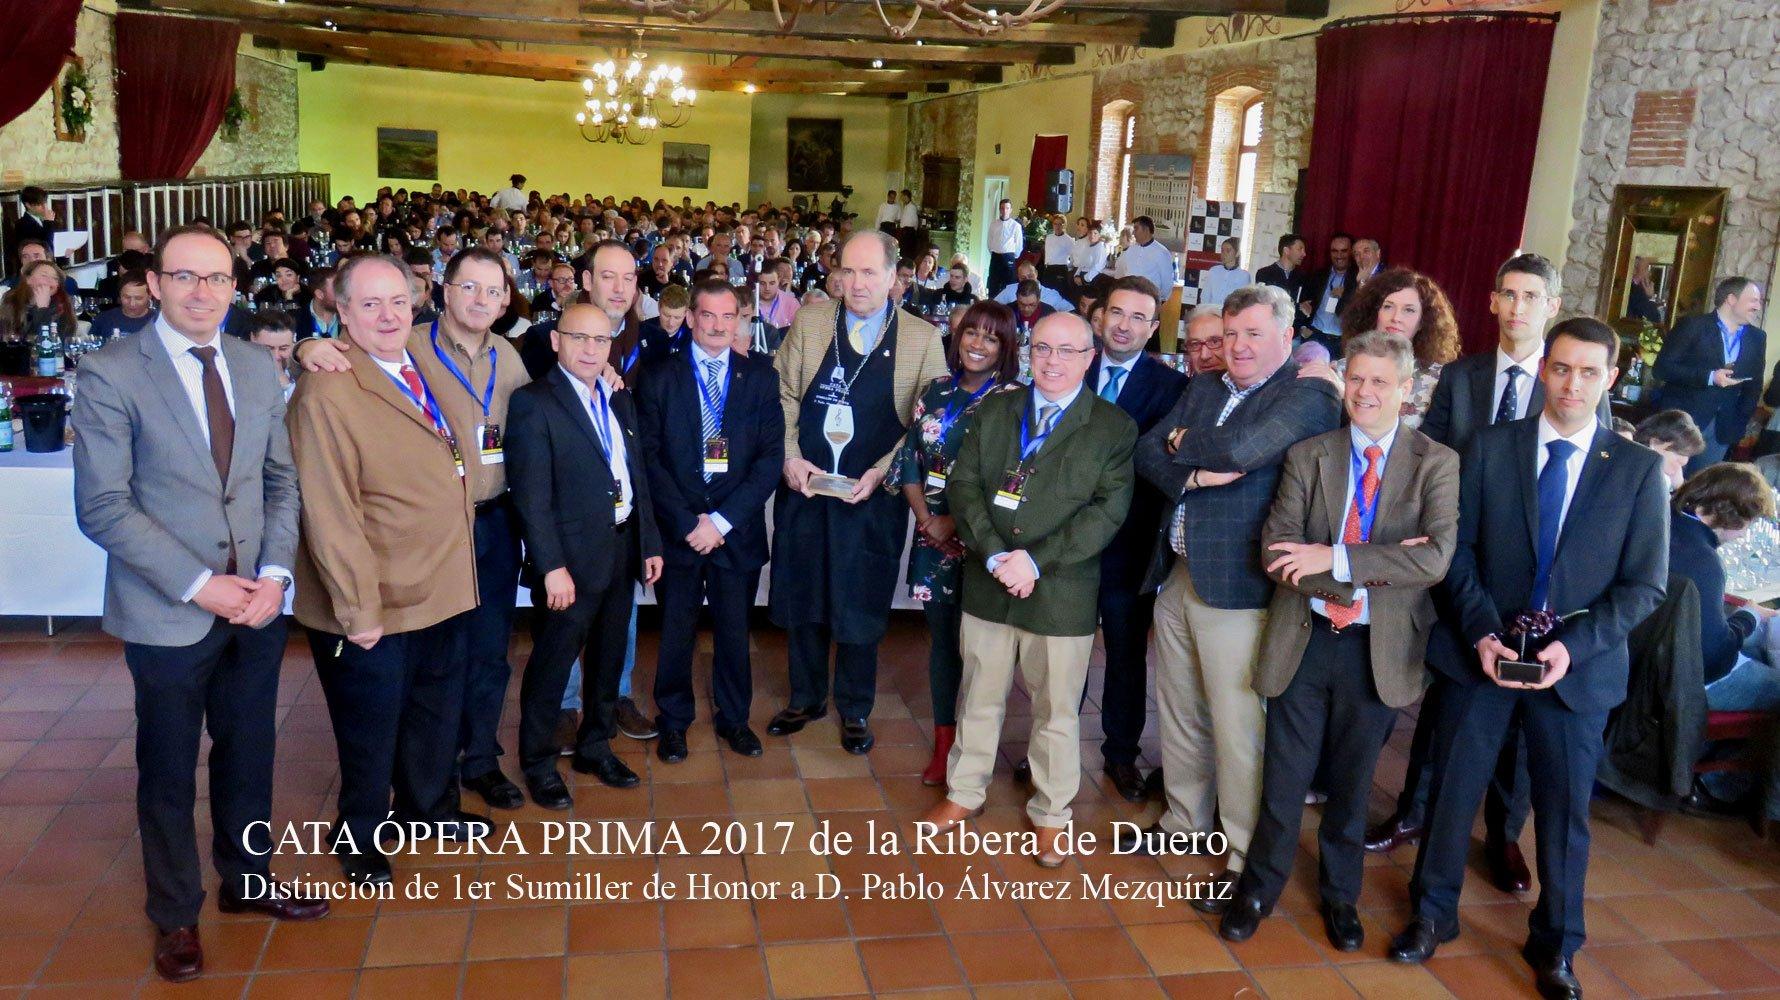 CATA ÓPERA PRIMA 2017 de la Ribera de Duero. Distinción de 1er Sumiller de Honor a D. Pablo Álvarez Mezquíriz